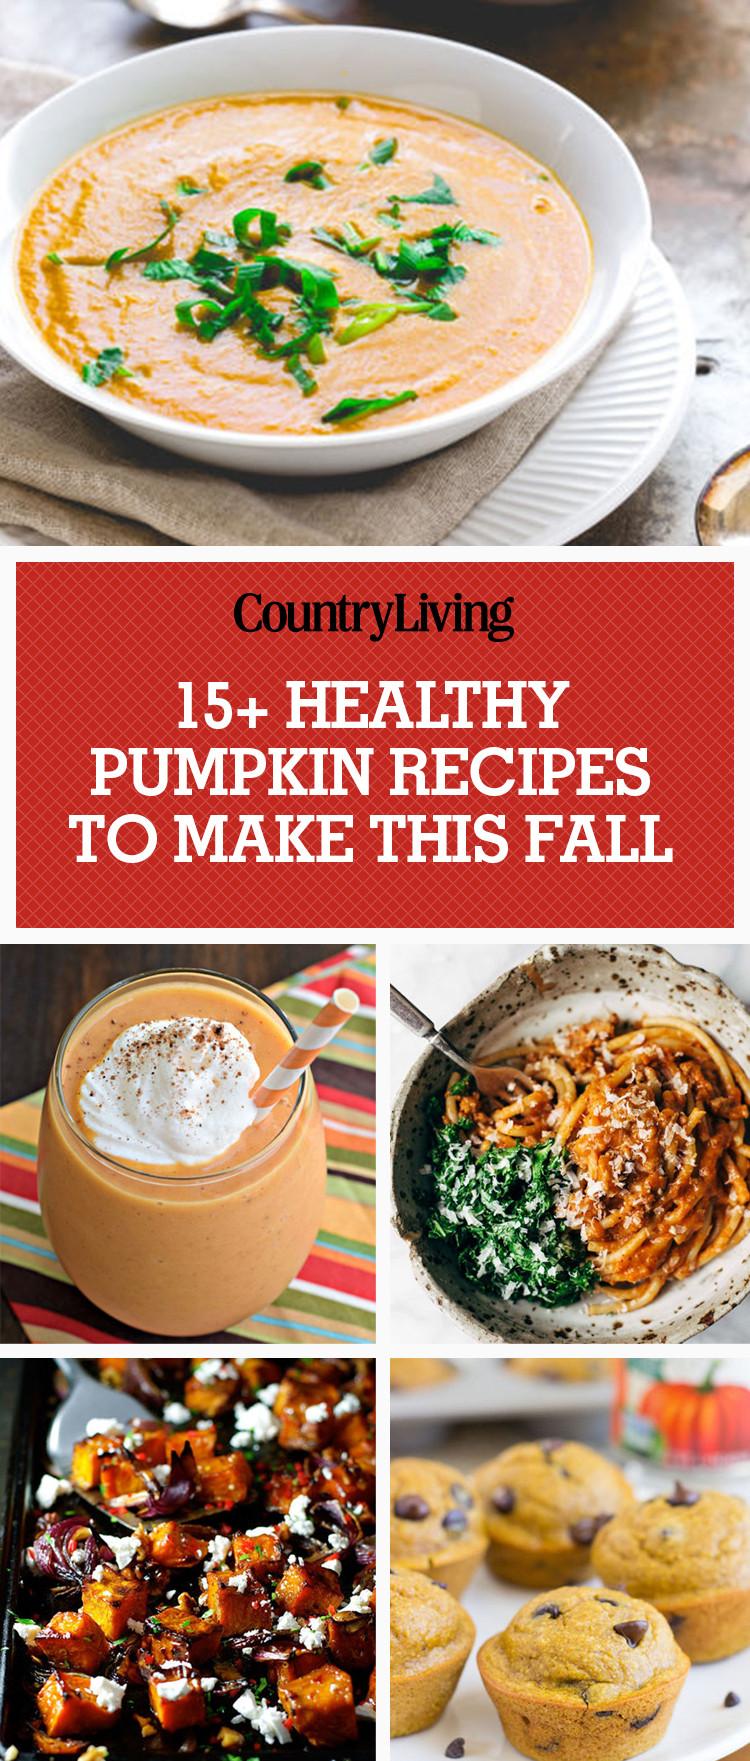 Healthy Pumpkin Recipes Dinner  16 Healthy Pumpkin Recipes Low Fat Ways to Eat Pumpkin